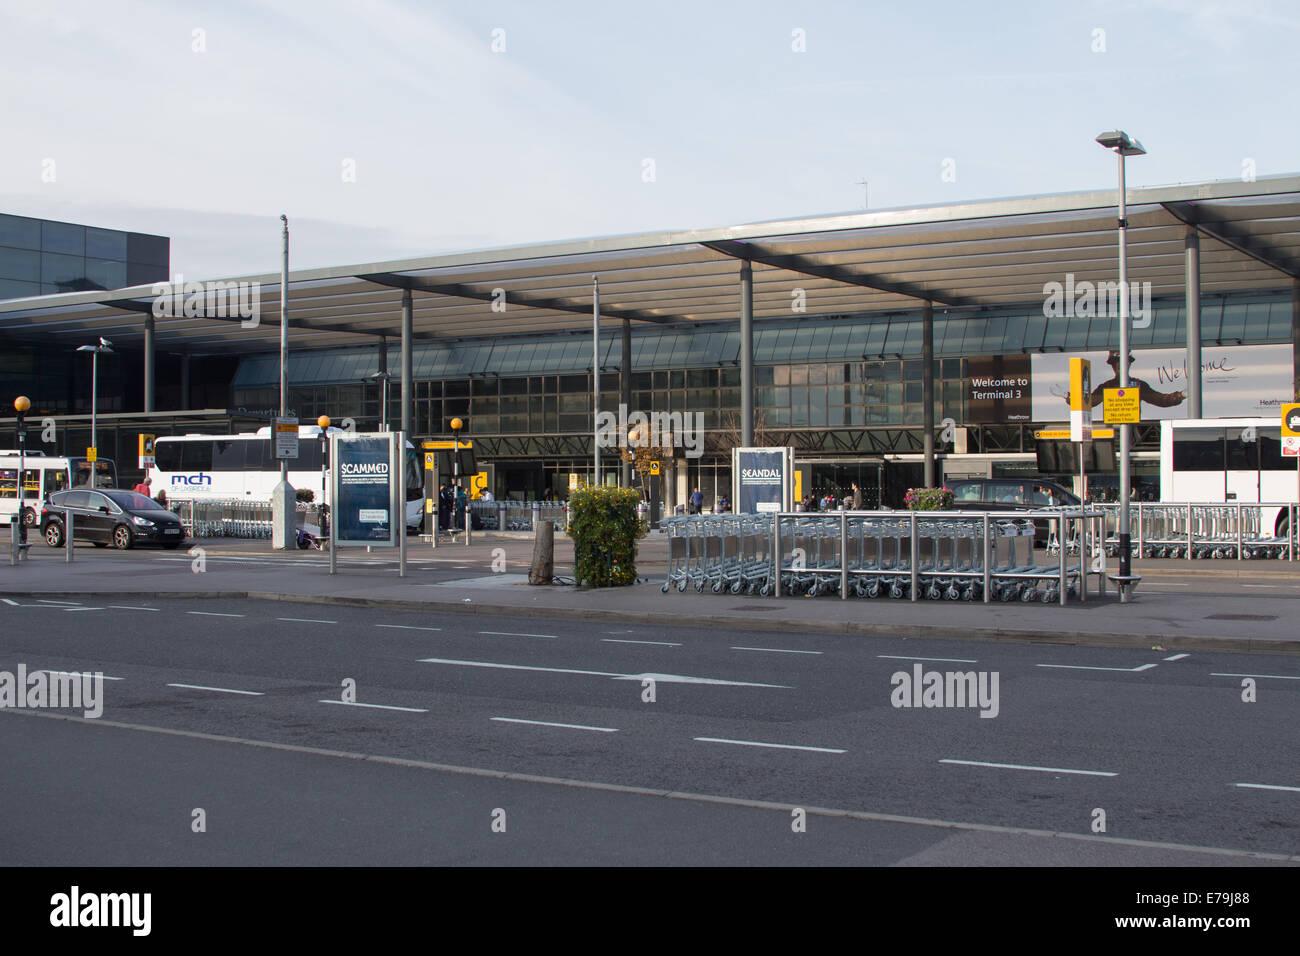 Airport Drop Off Heathrow Stock Photos Airport Drop Off Heathrow